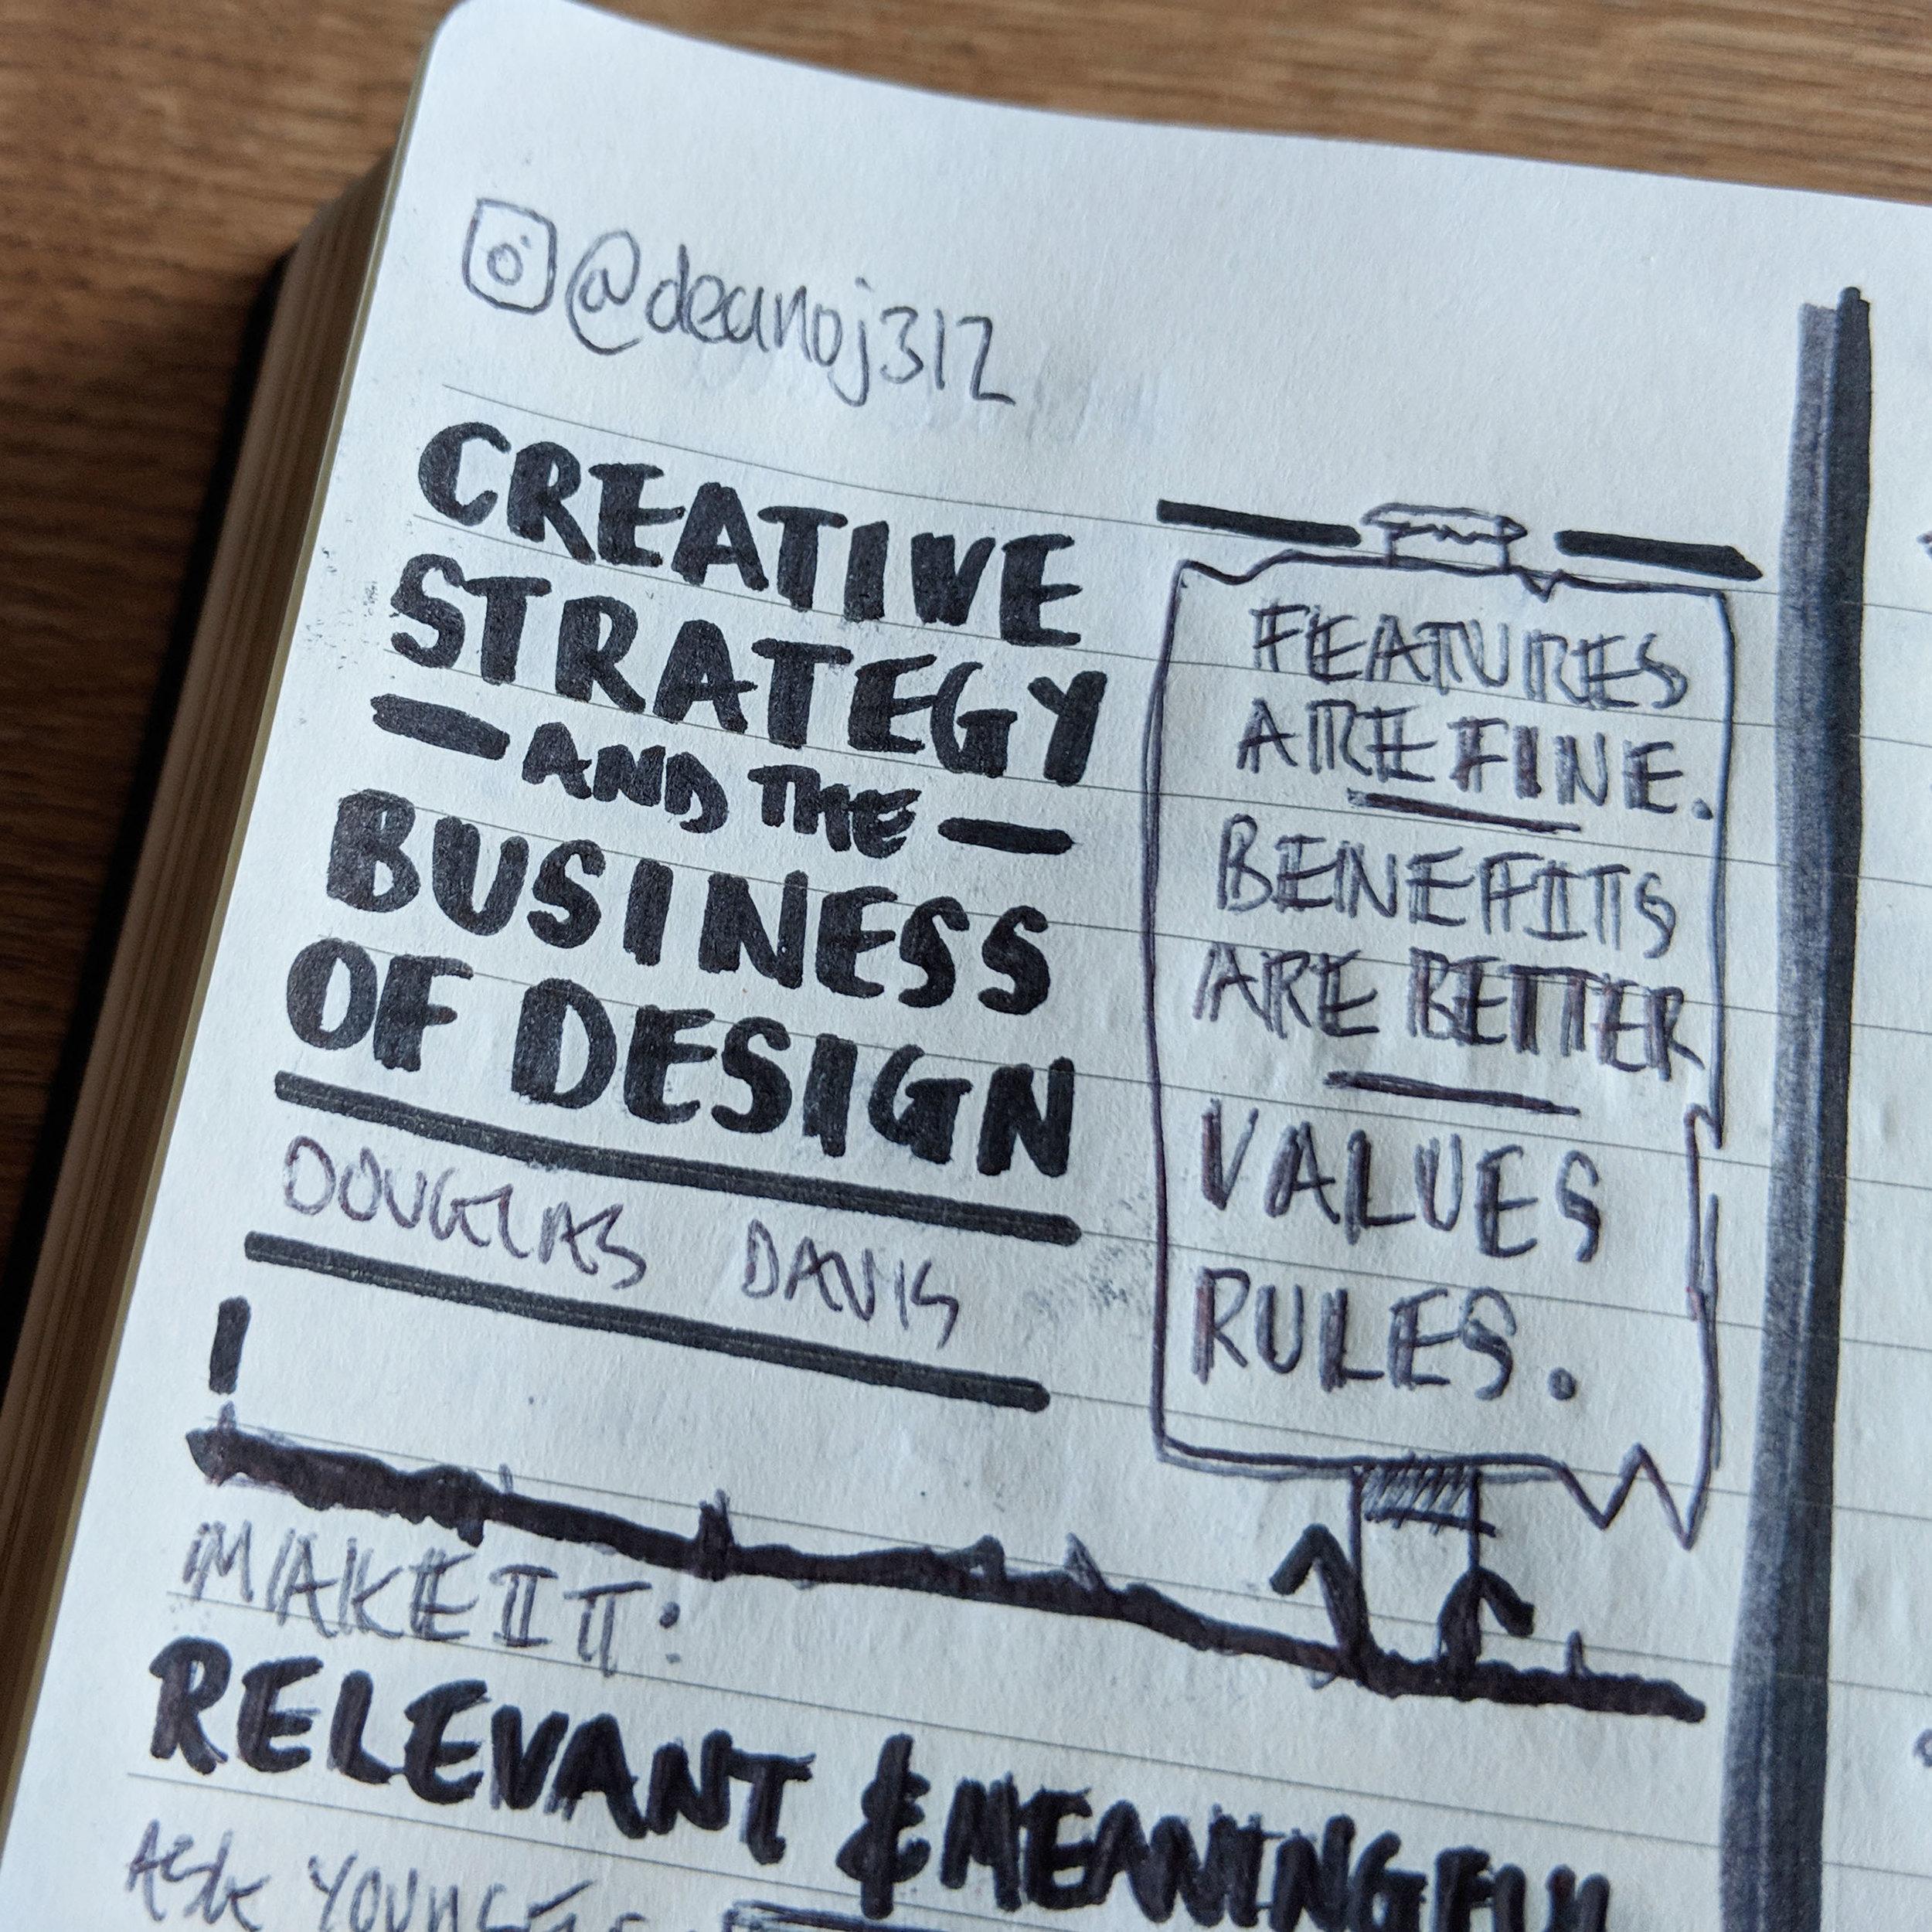 CreativeStrategyAndTheBusinessOfDesign_Part10.1.jpg